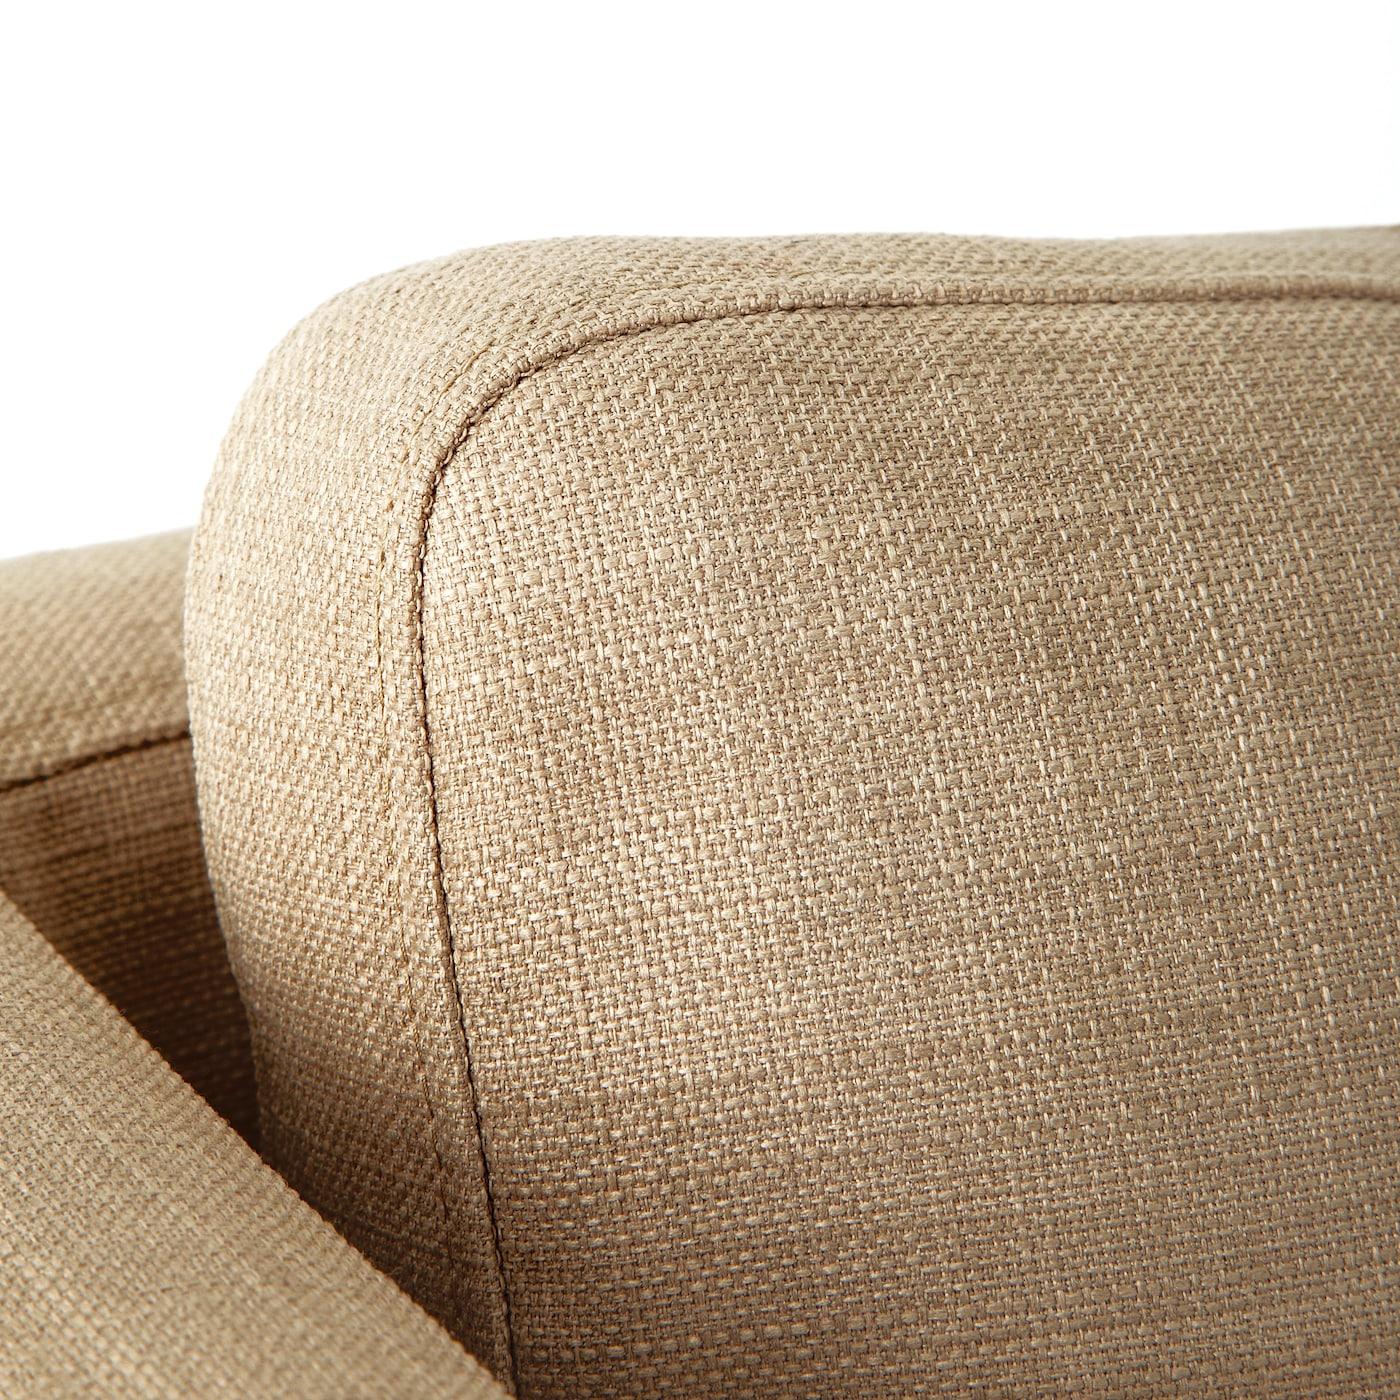 Ekerø Ikea lenestol | FINN.no